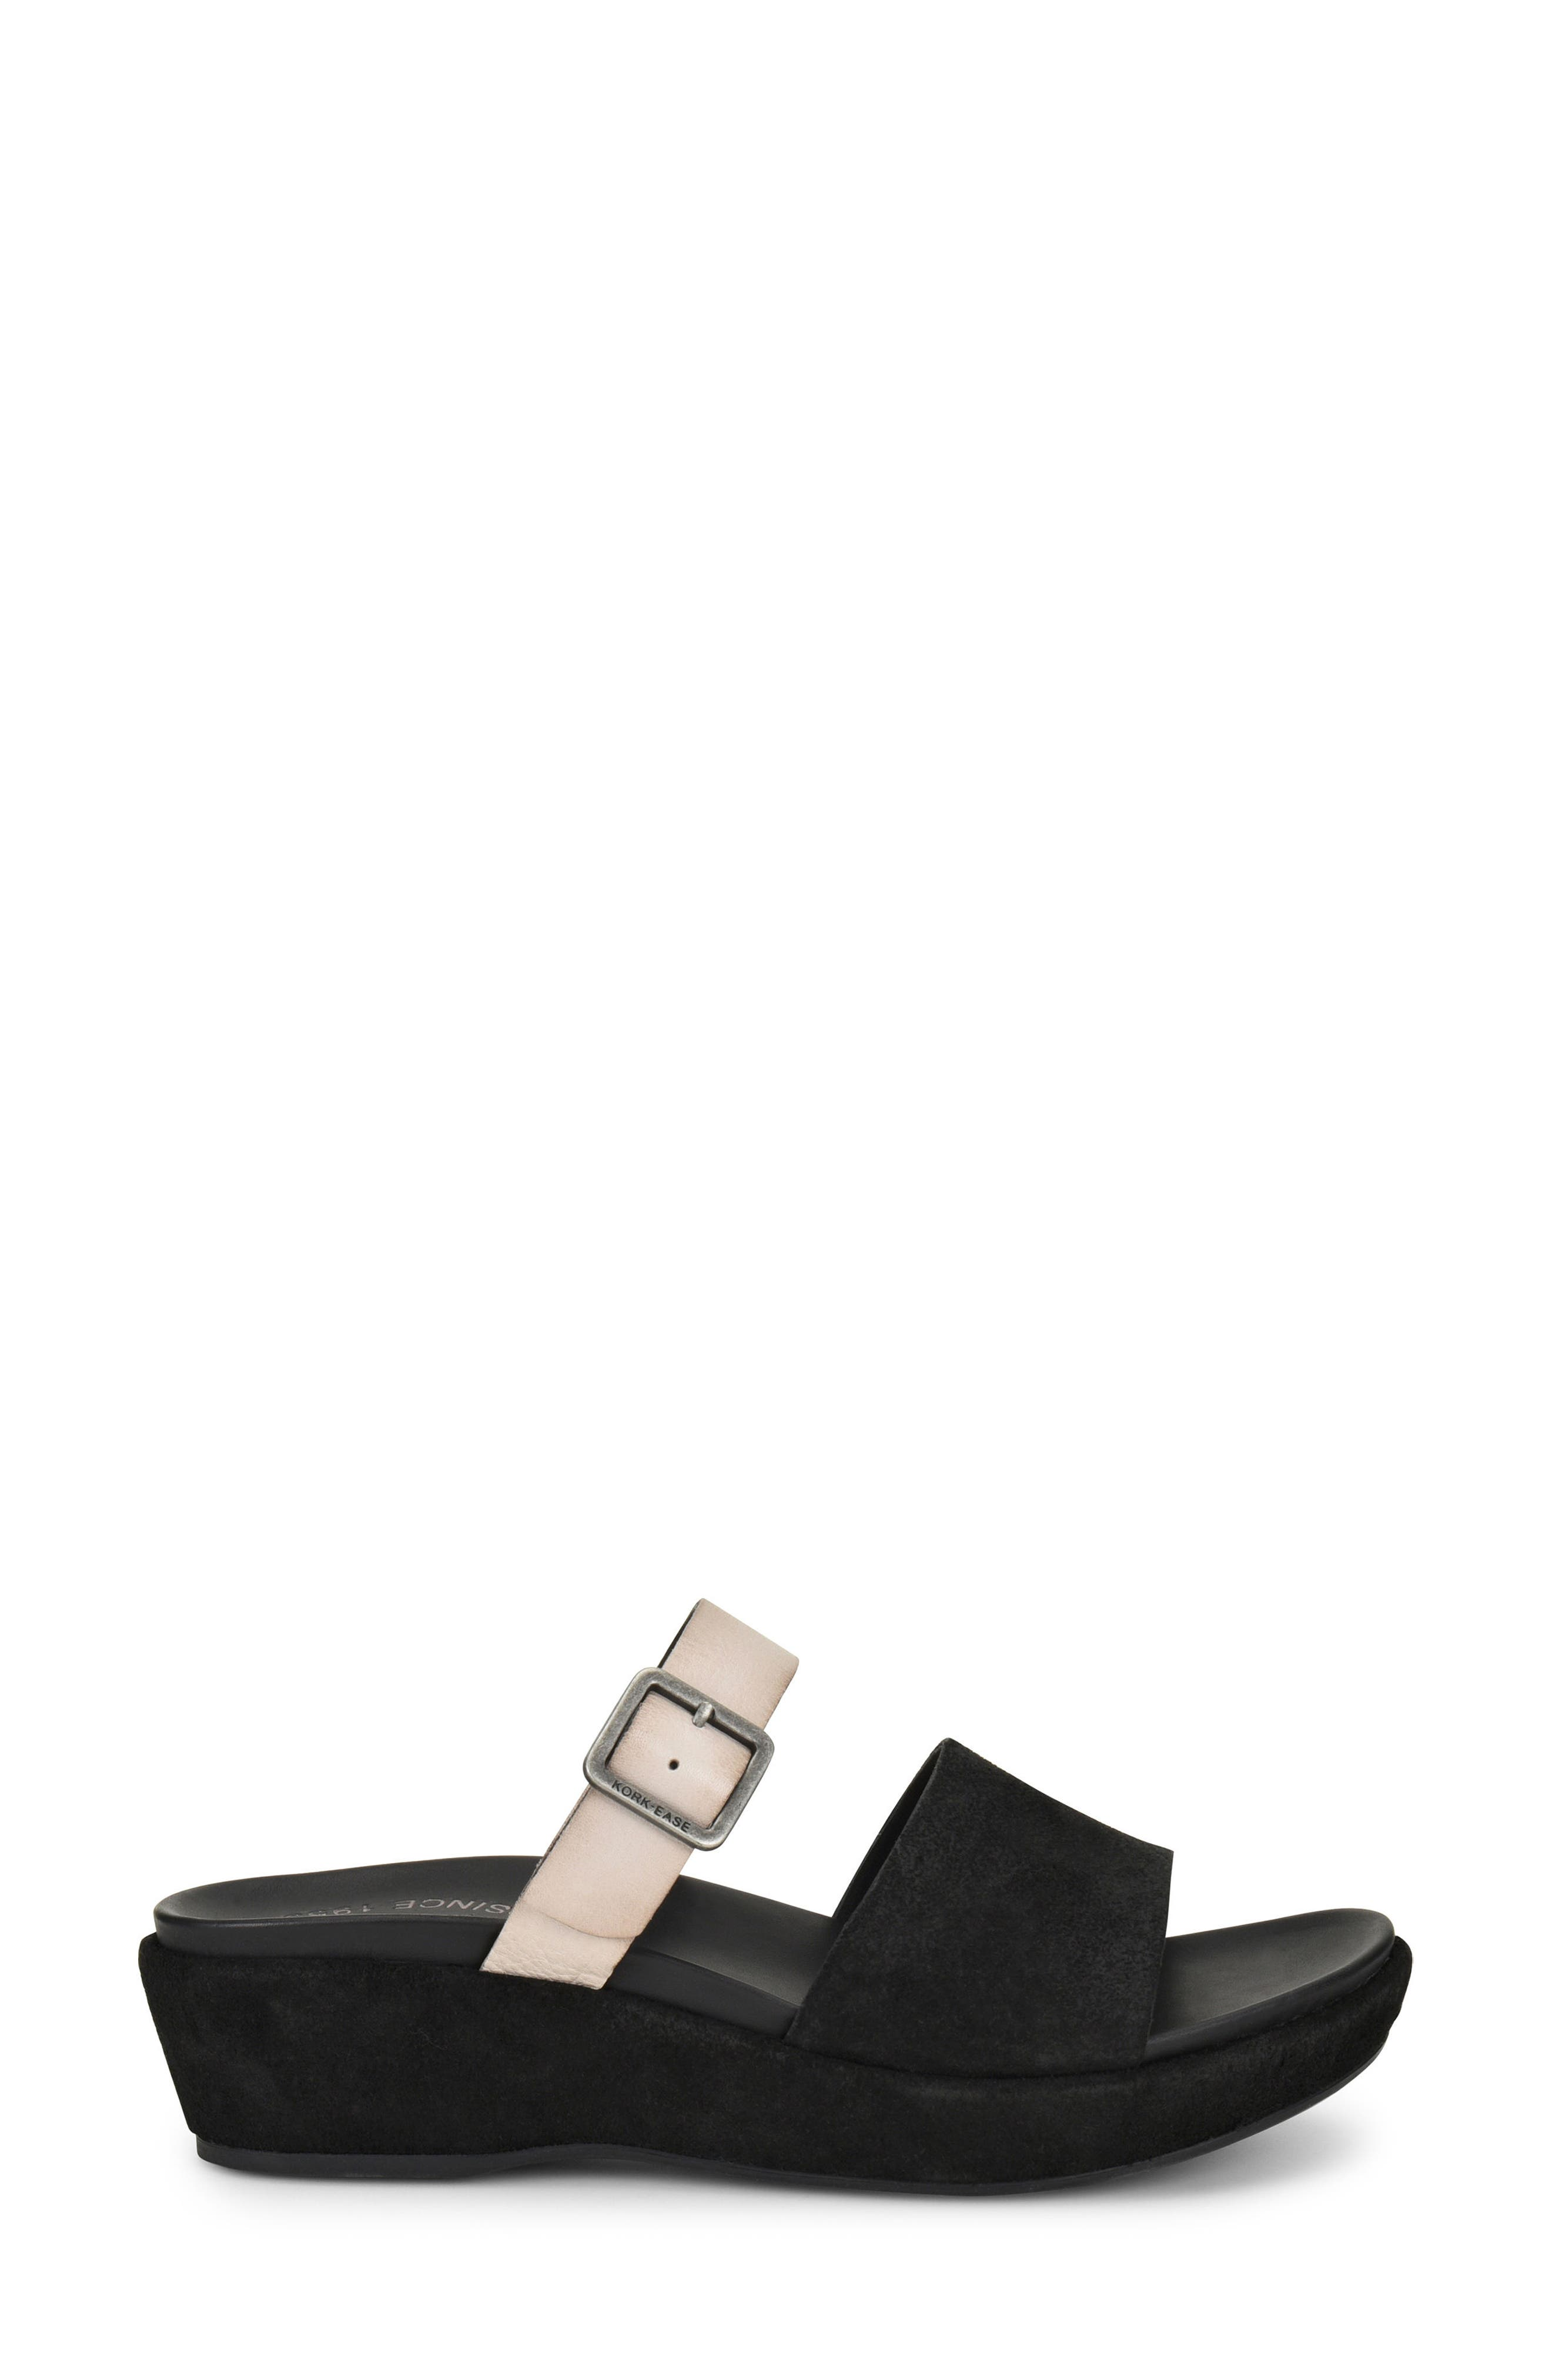 KORK-EASE<SUP>®</SUP>, Bisti Wedge Slide Sandal, Alternate thumbnail 3, color, BLACK/ GREY LEATHER